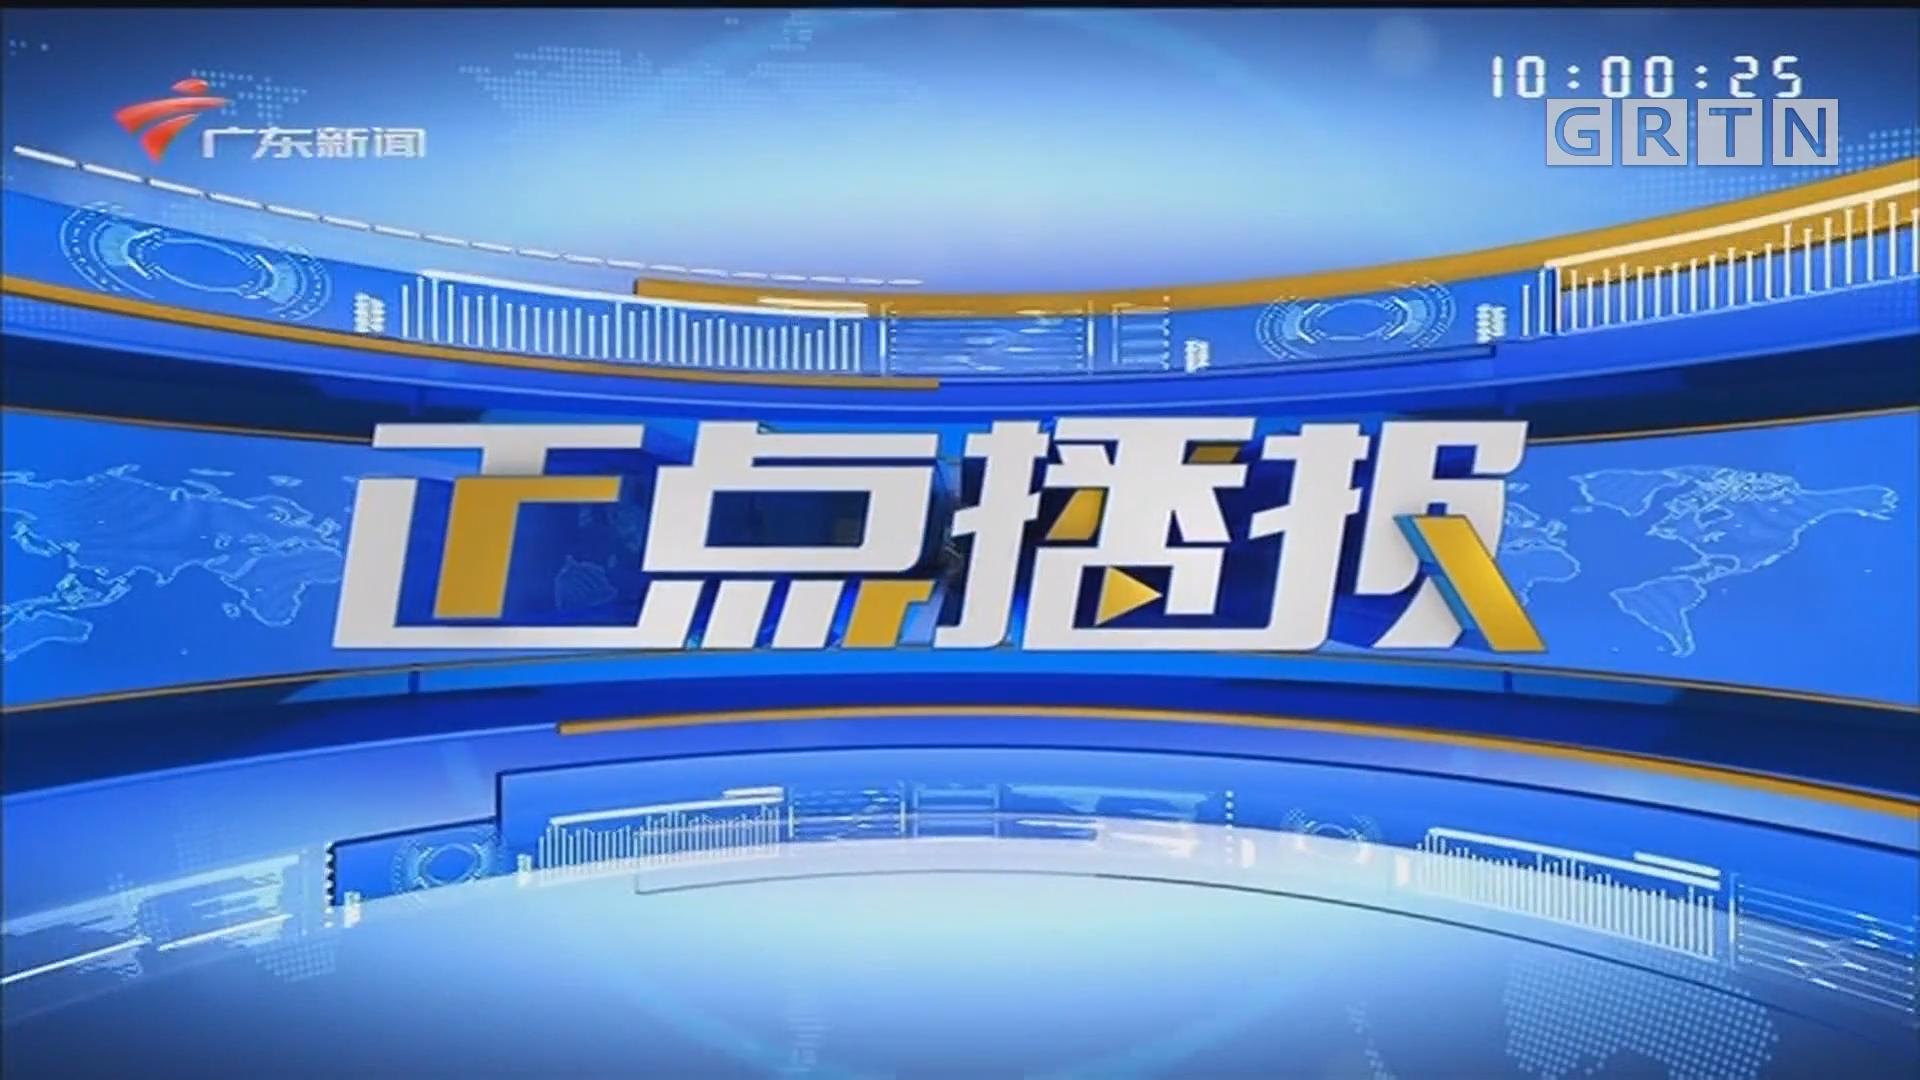 [HD][2020-01-12-10:00]正点播报:春运第二天:多地铁路保障旅客出行顺畅